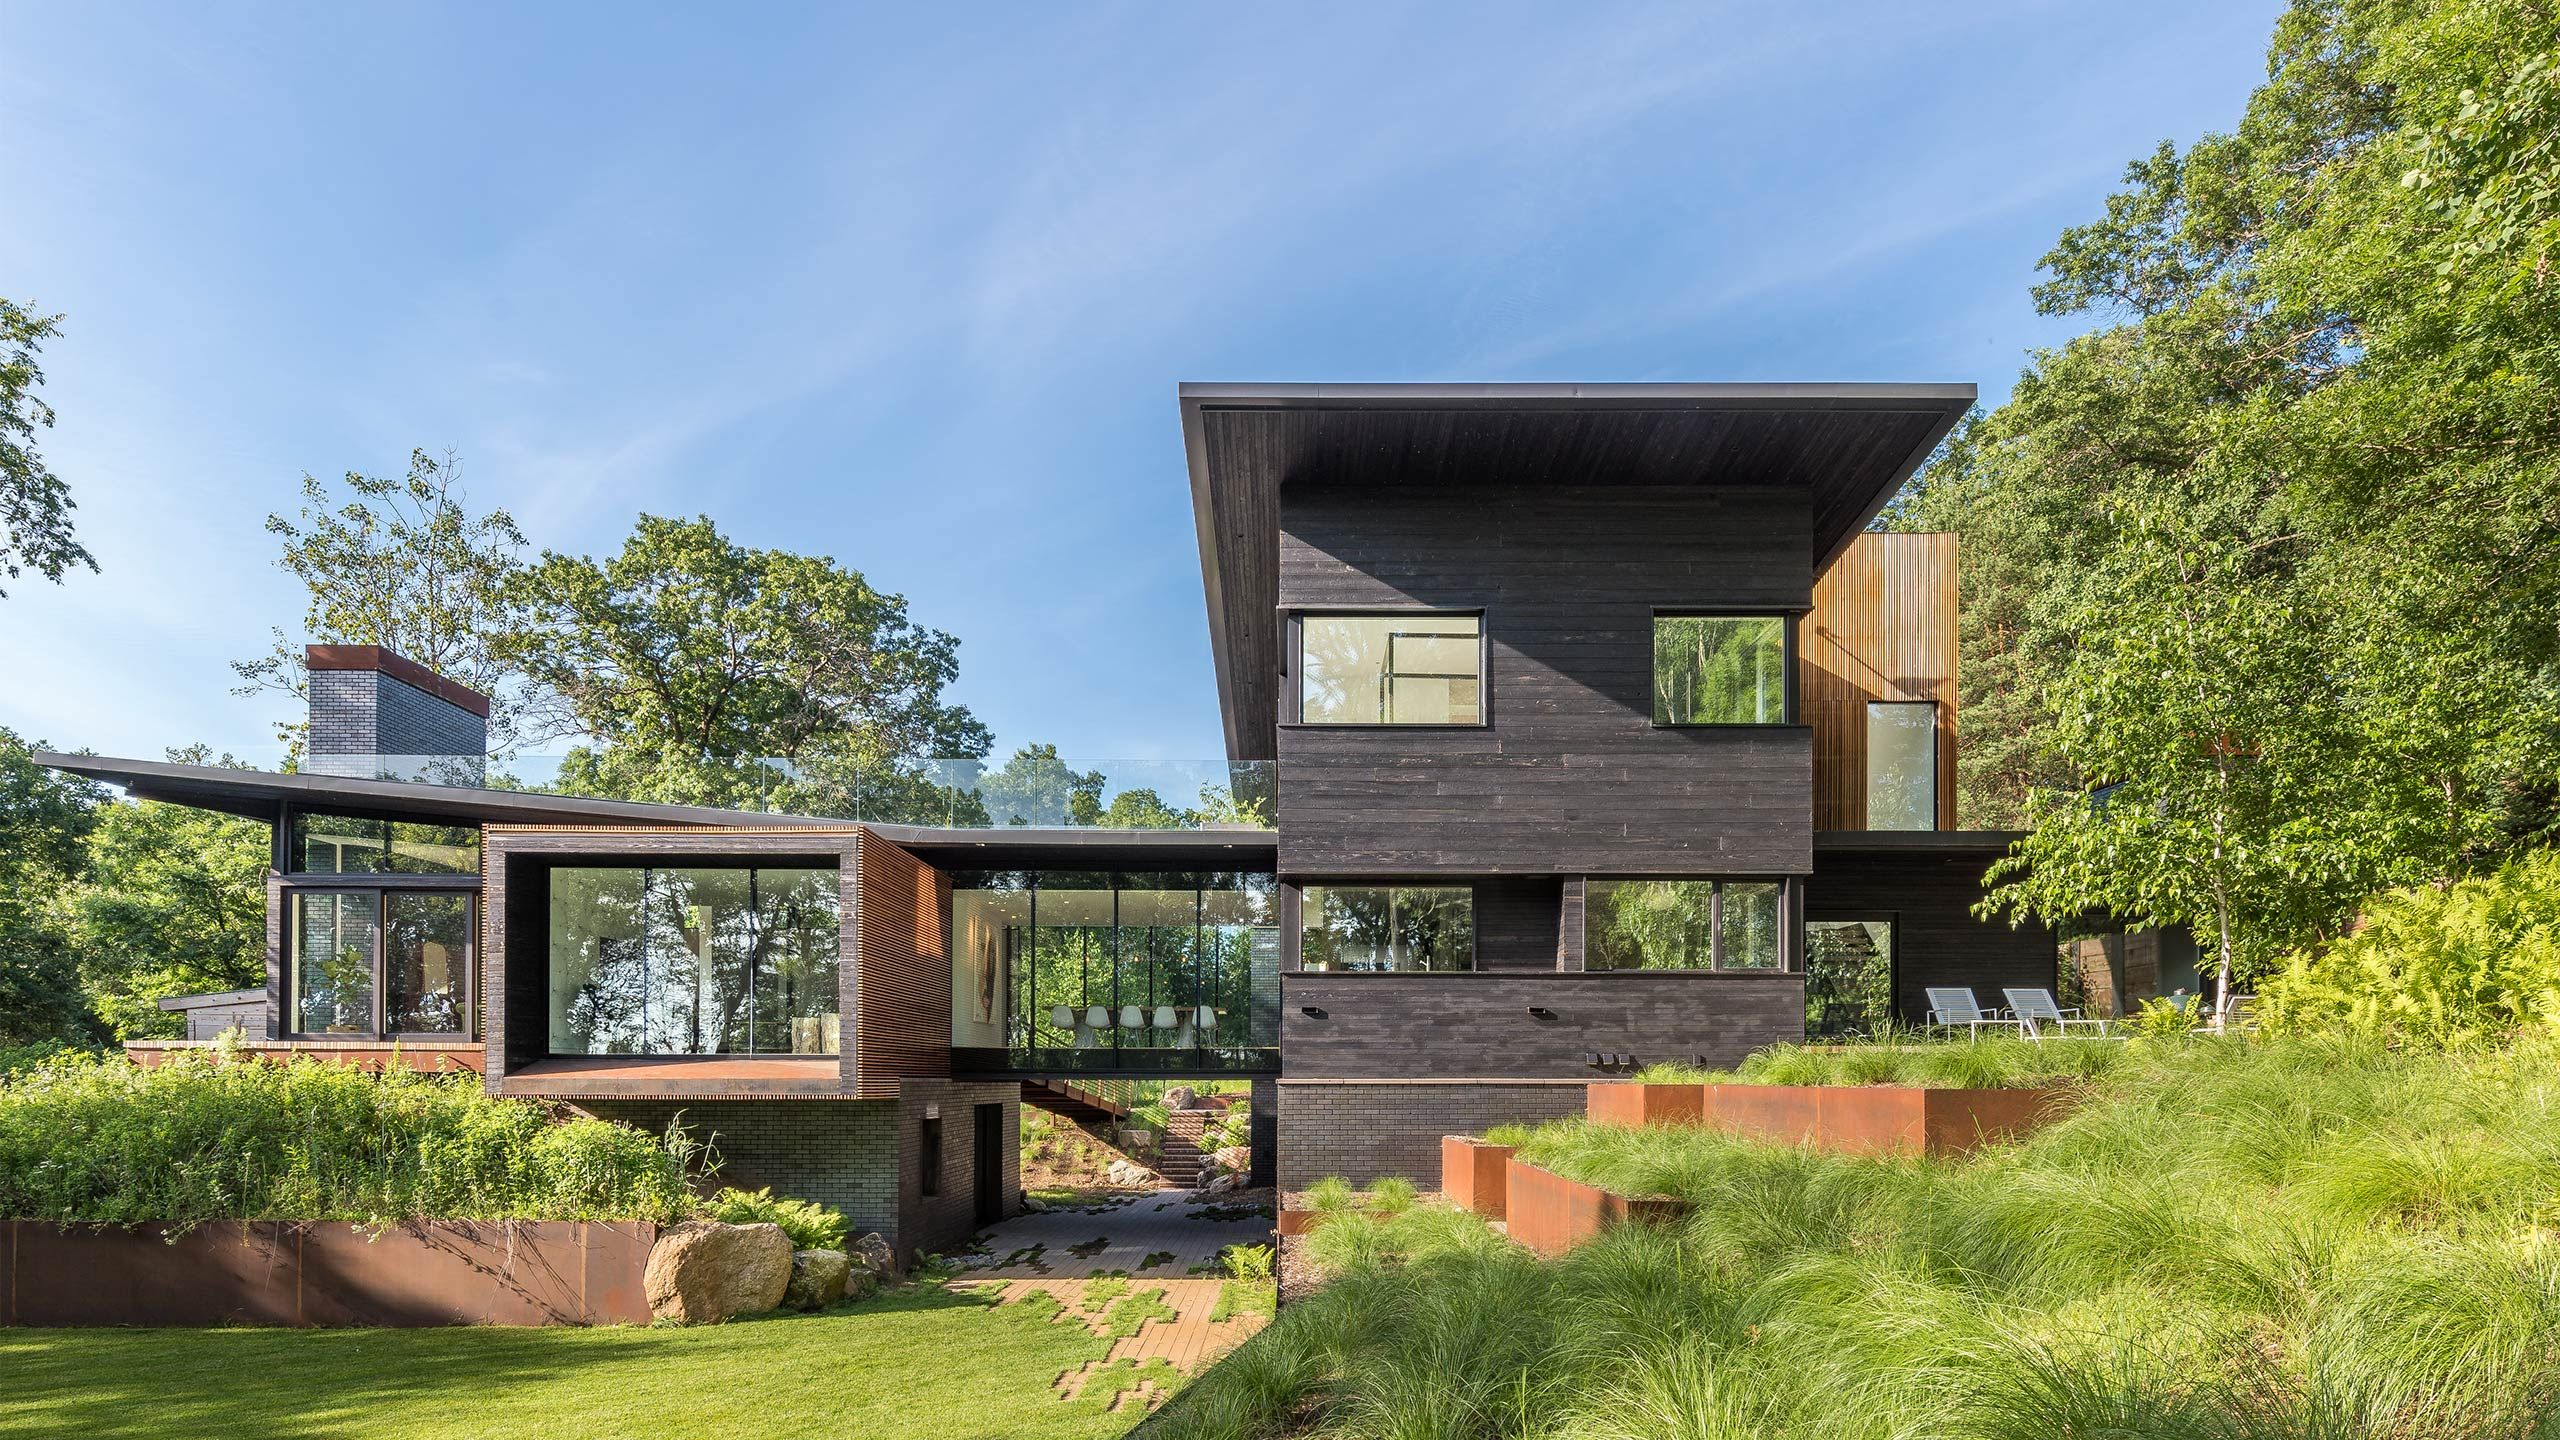 SALA ARCHITECTS' SHADOW BOX RESIDENCE